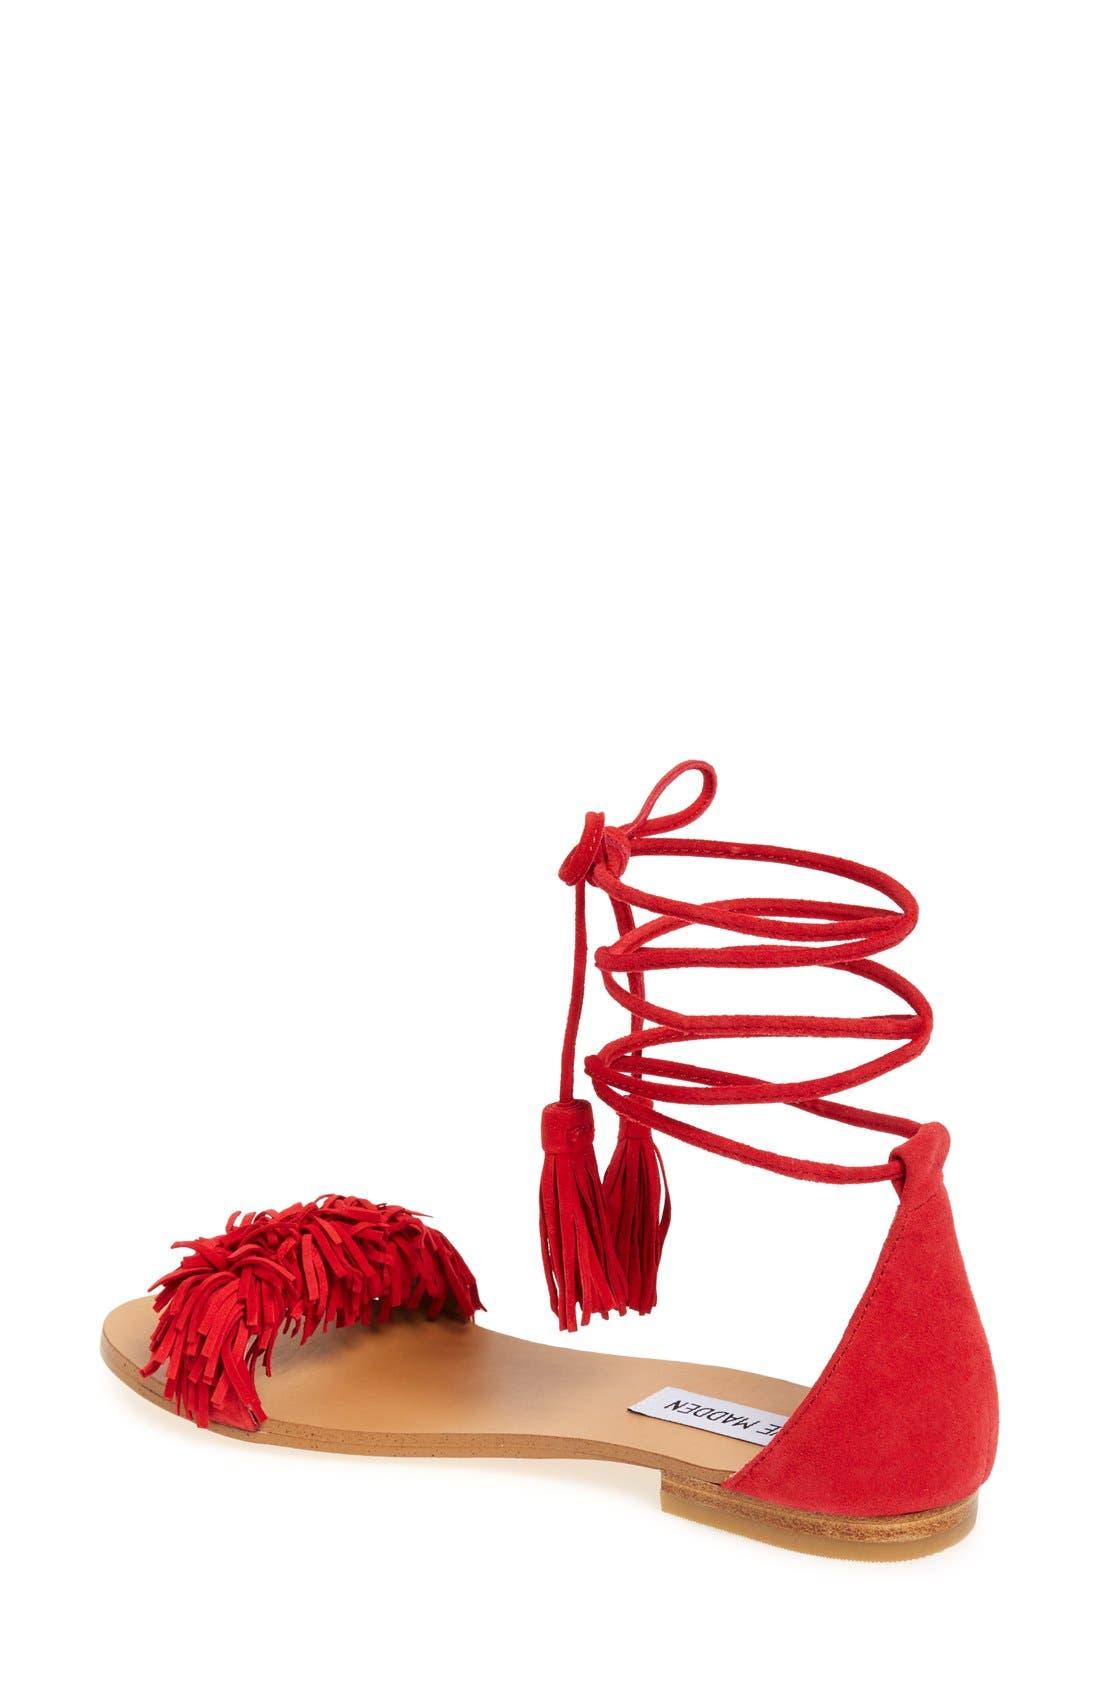 Alternate Image 2  - Steve Madden 'Sweetyy' Lace-Up Sandal (Women)